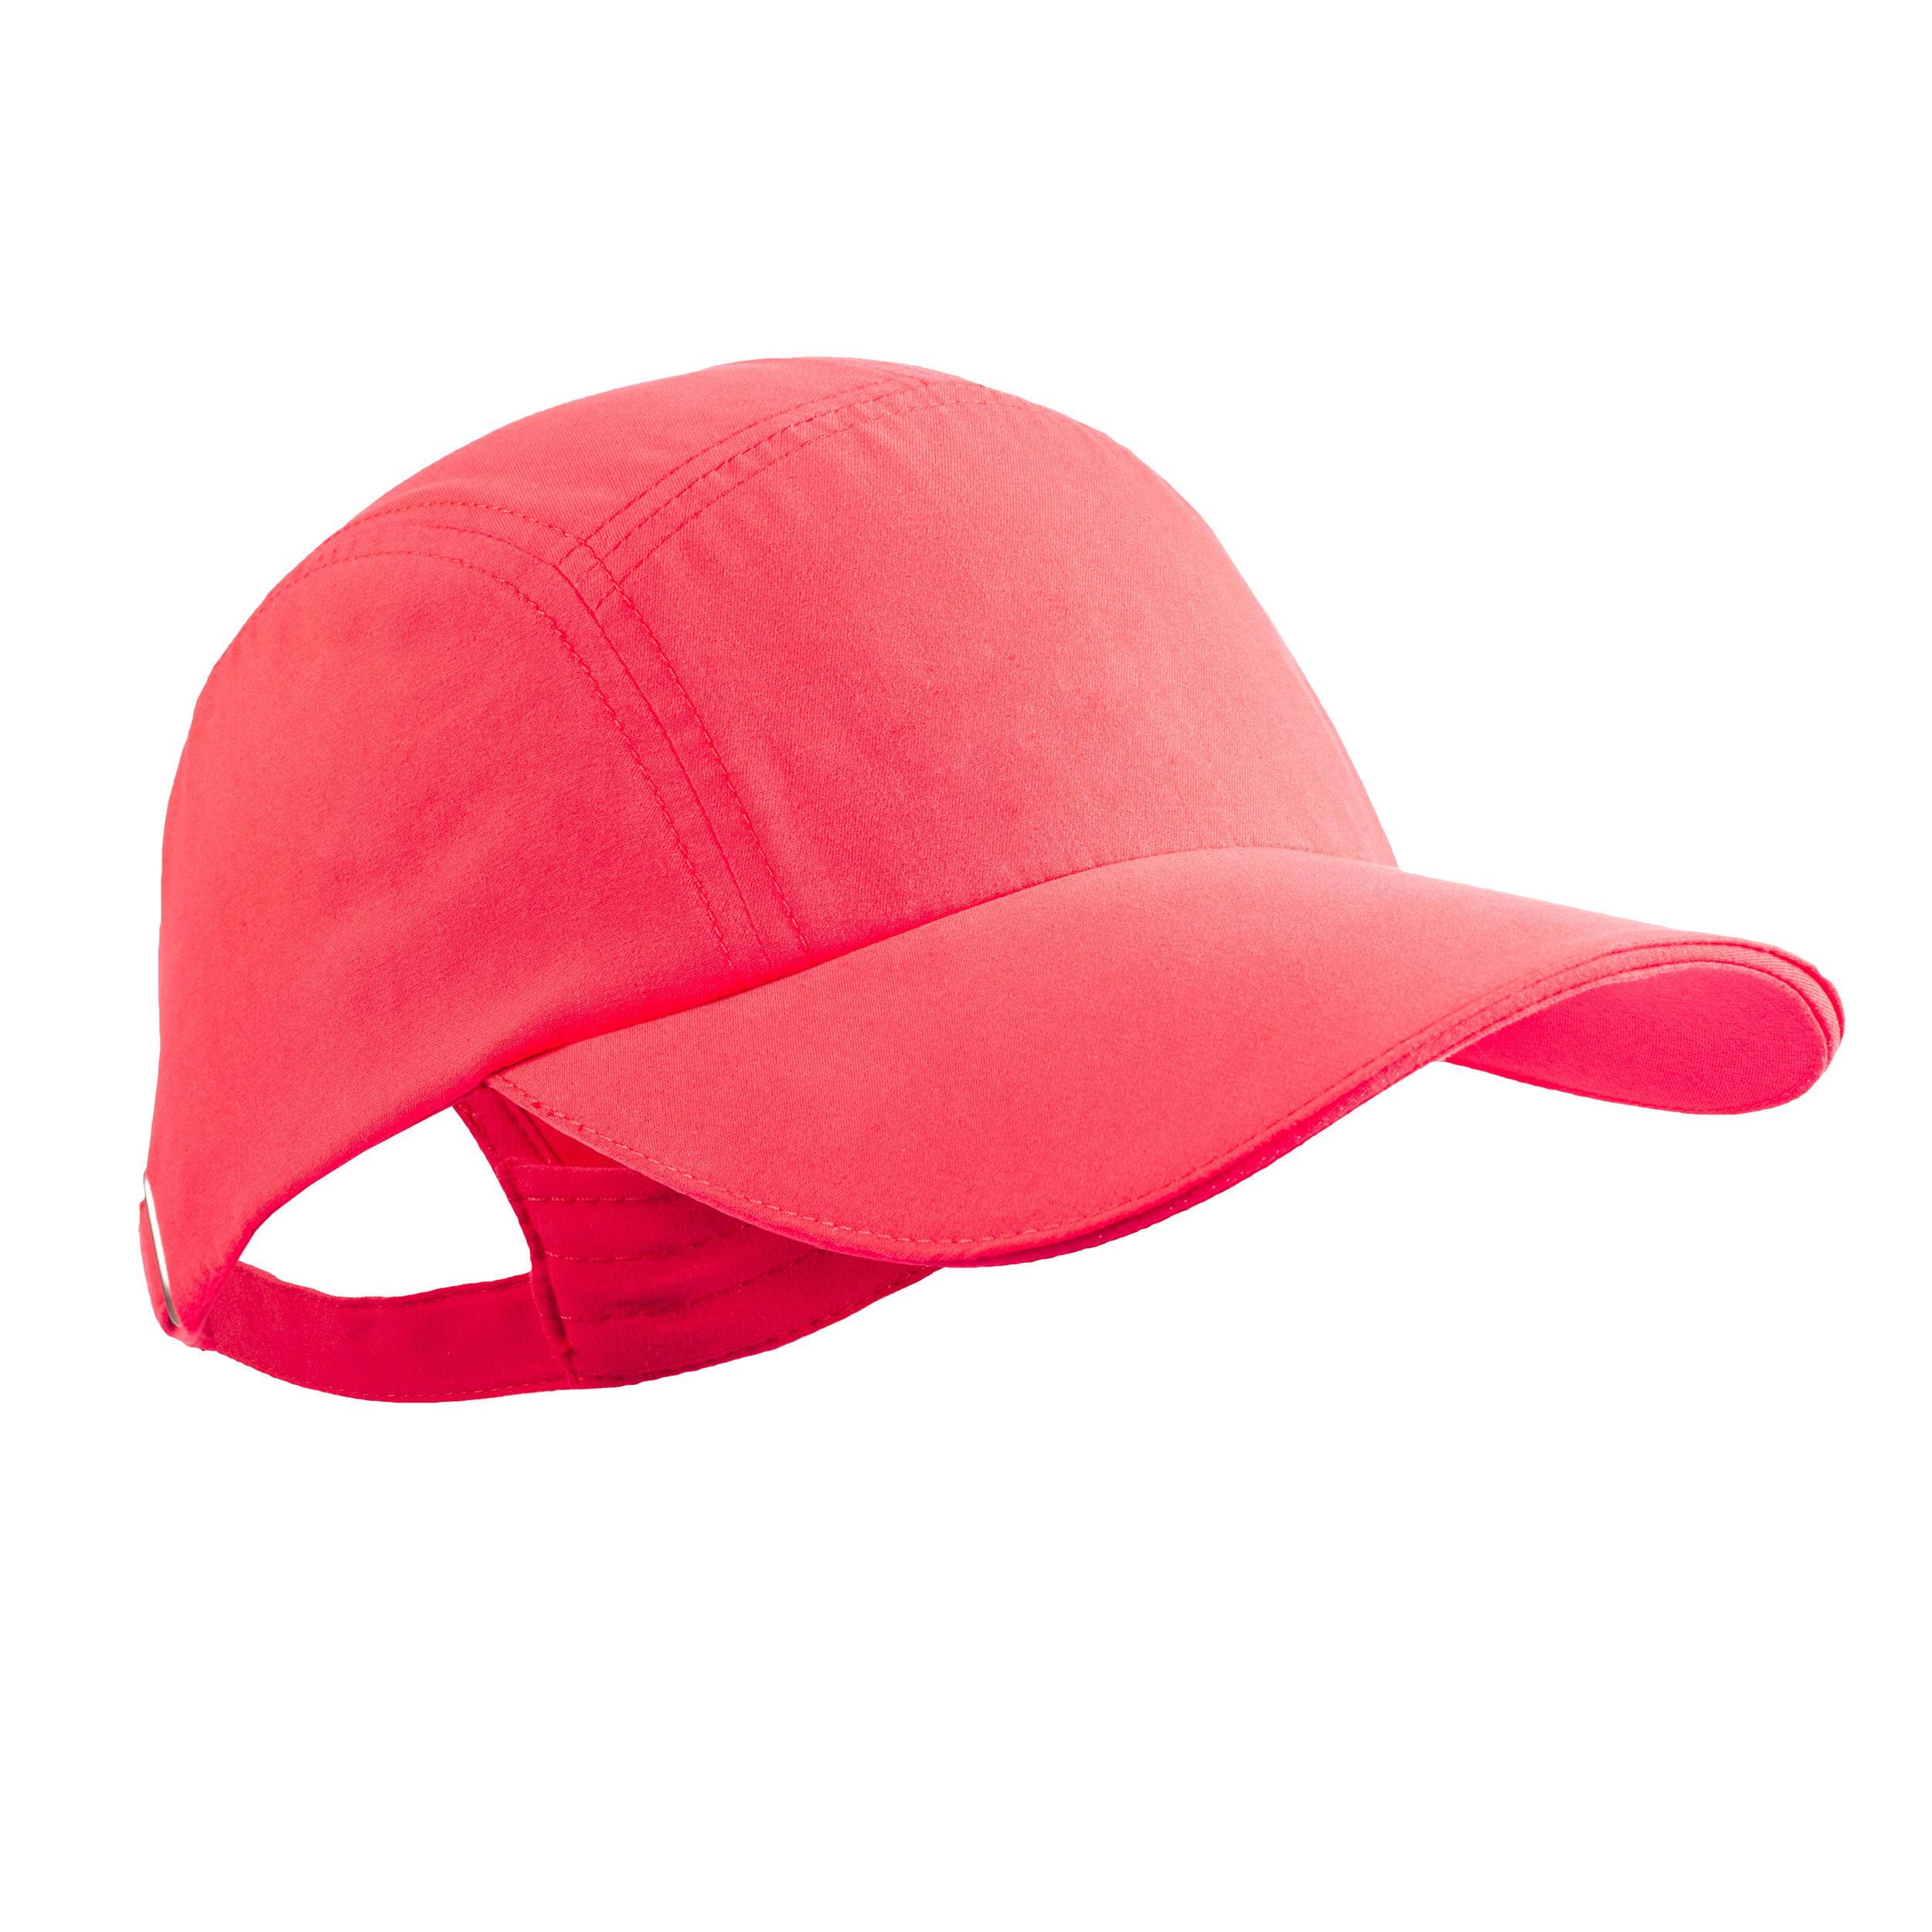 Șapcă Fitness Roz imagine